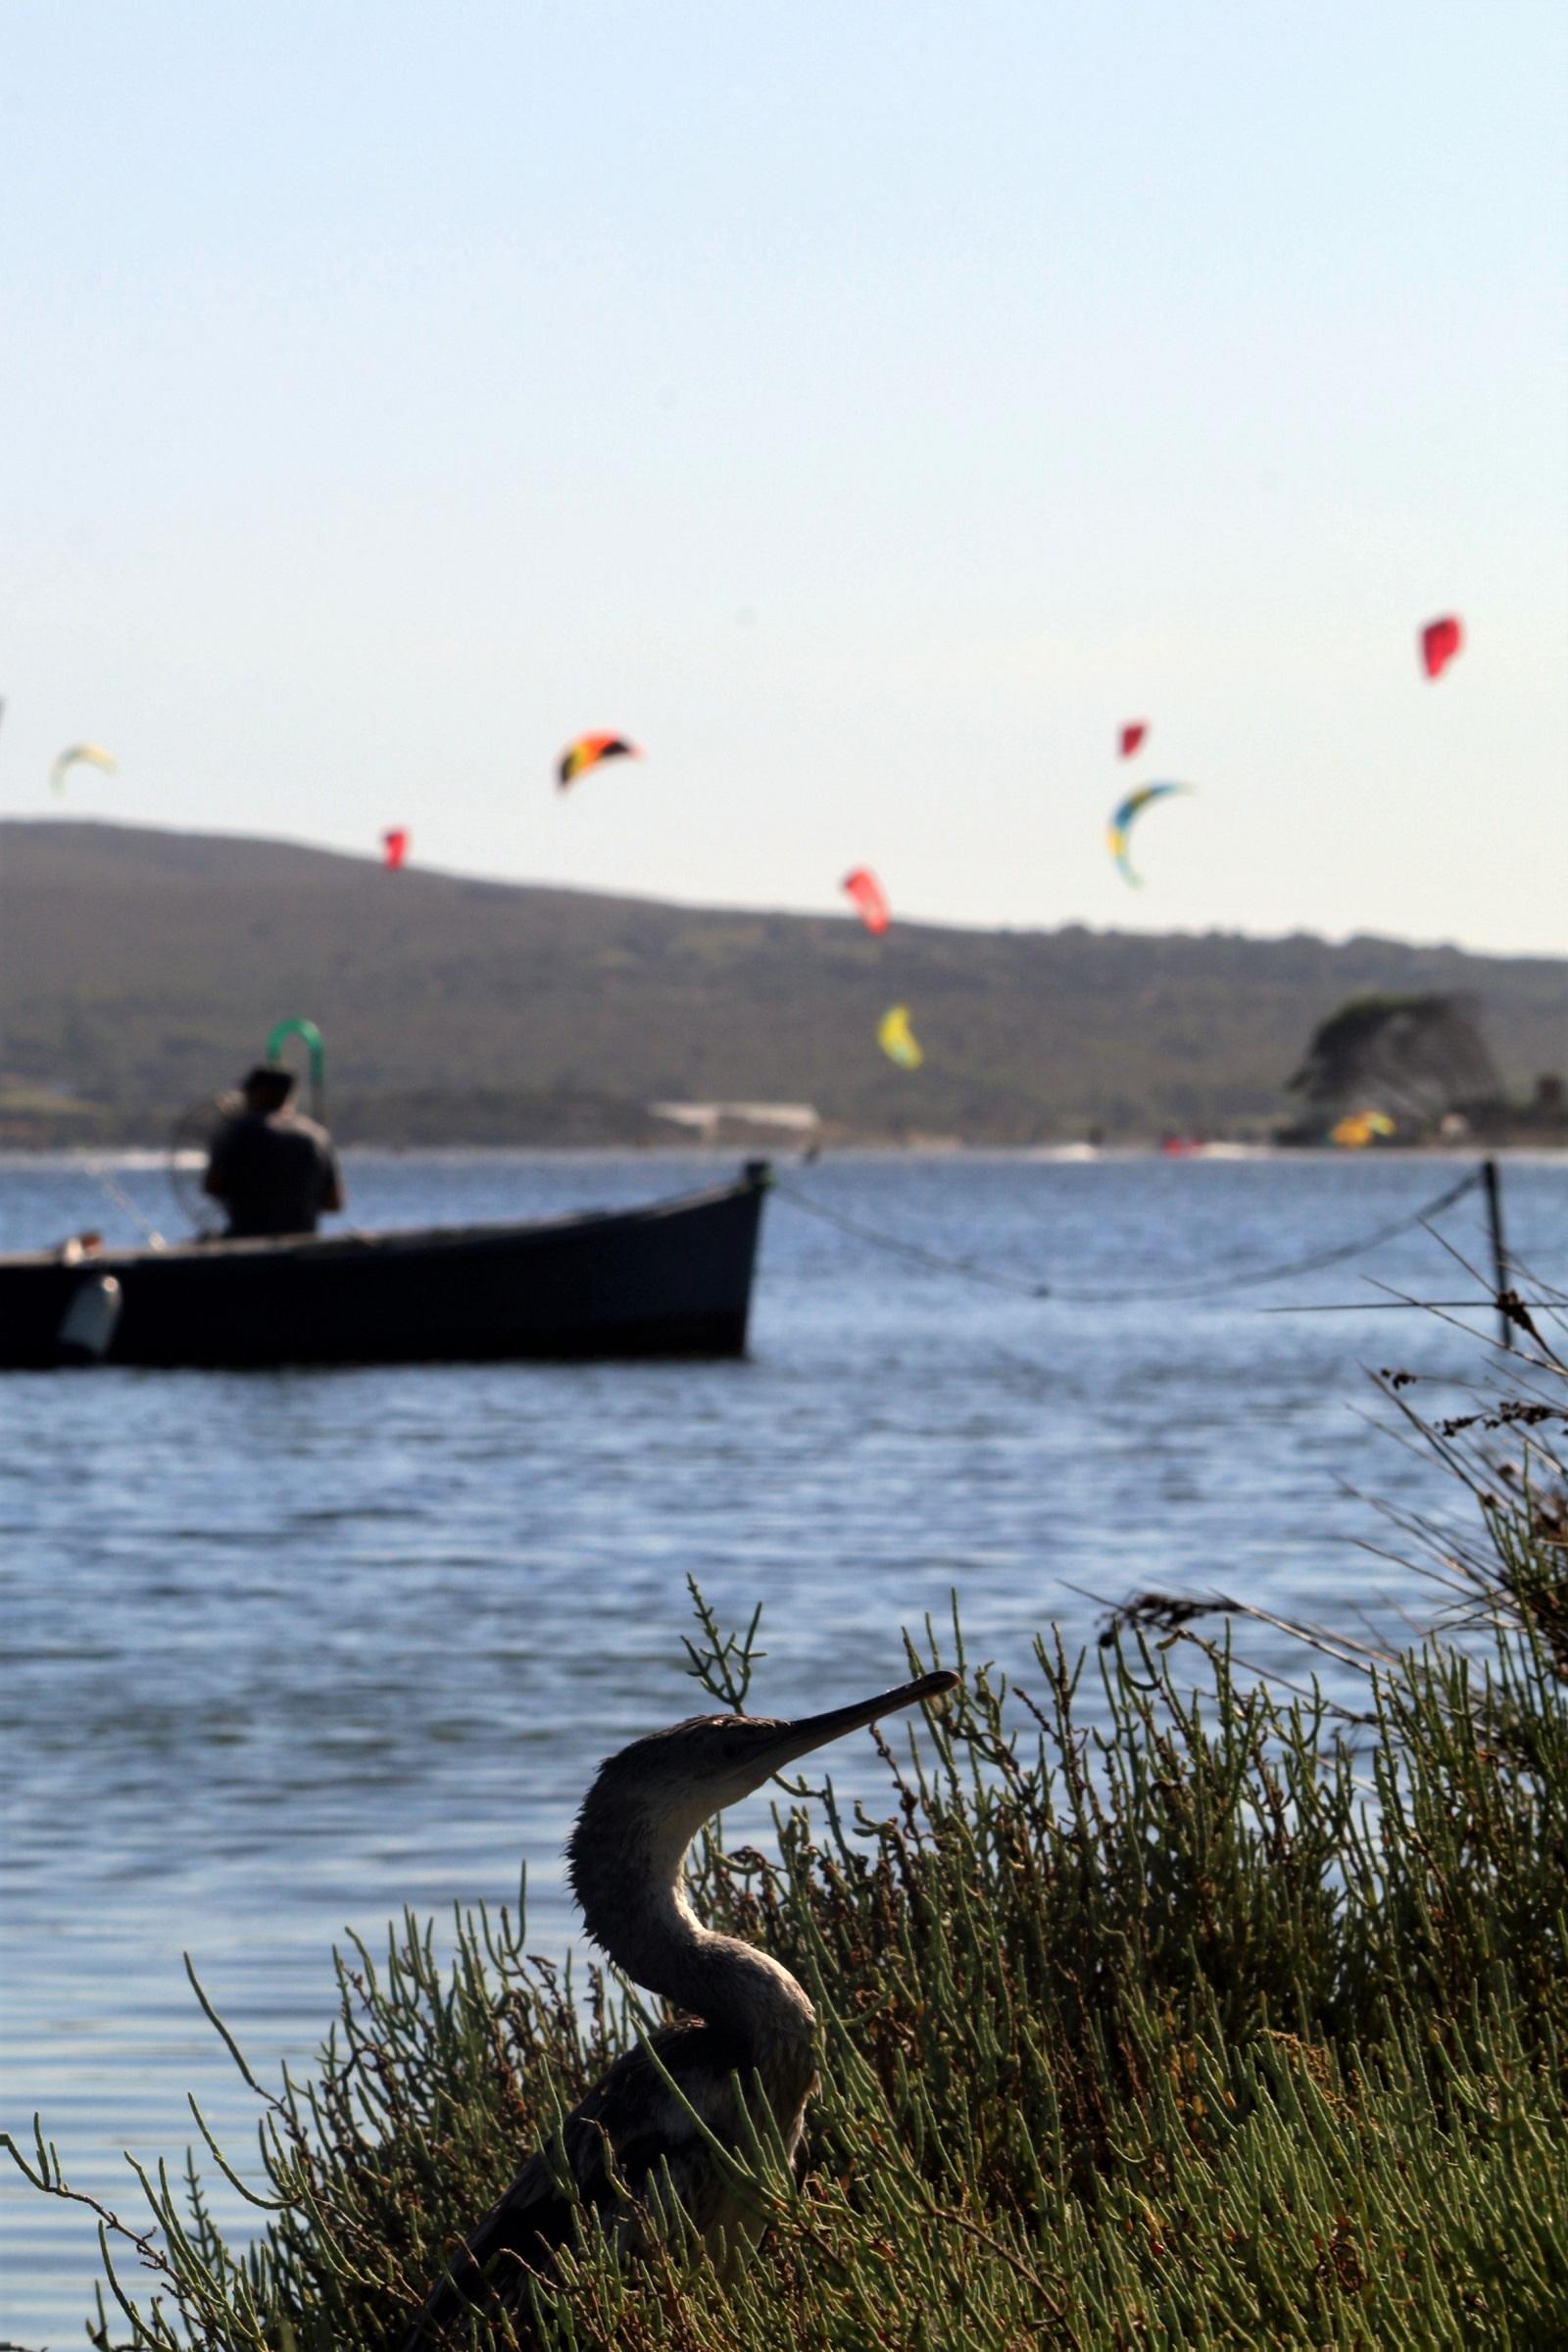 The Kite Spot of Punta Trettu in Sardinia